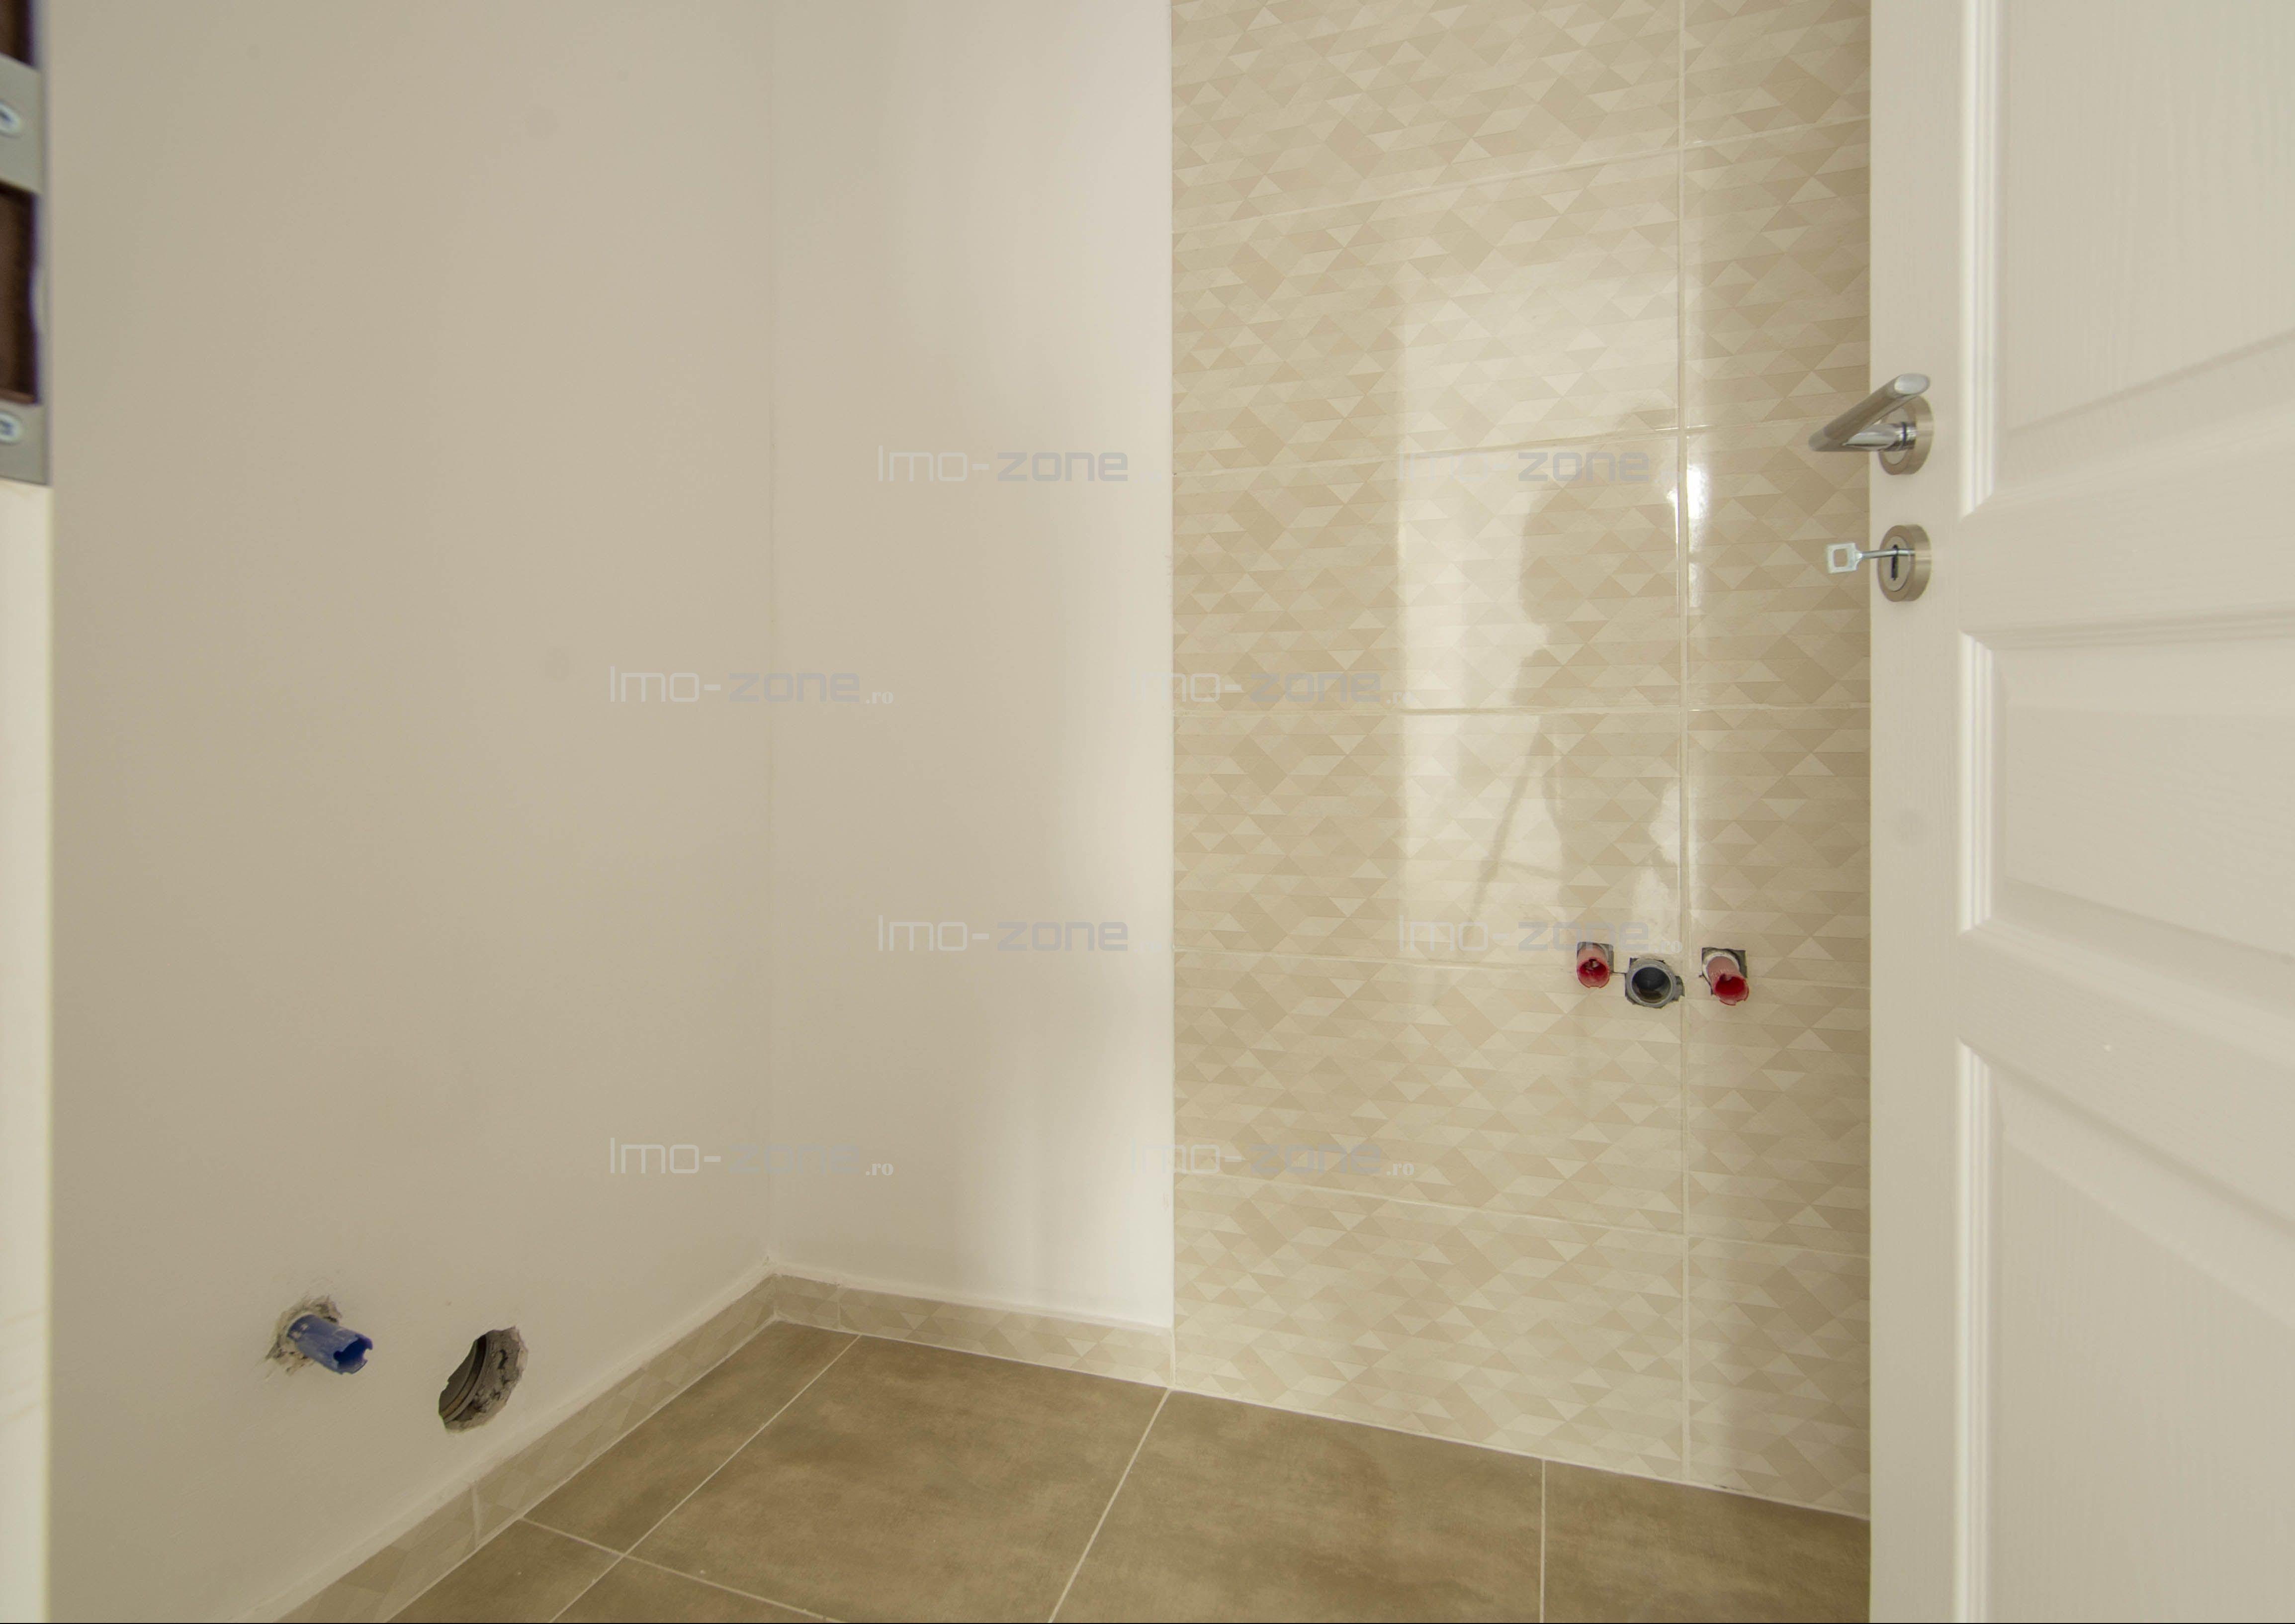 Apartament 2 camere Drumul Taberei, Prelungirea Ghencea /Funigeilor, comision 0%